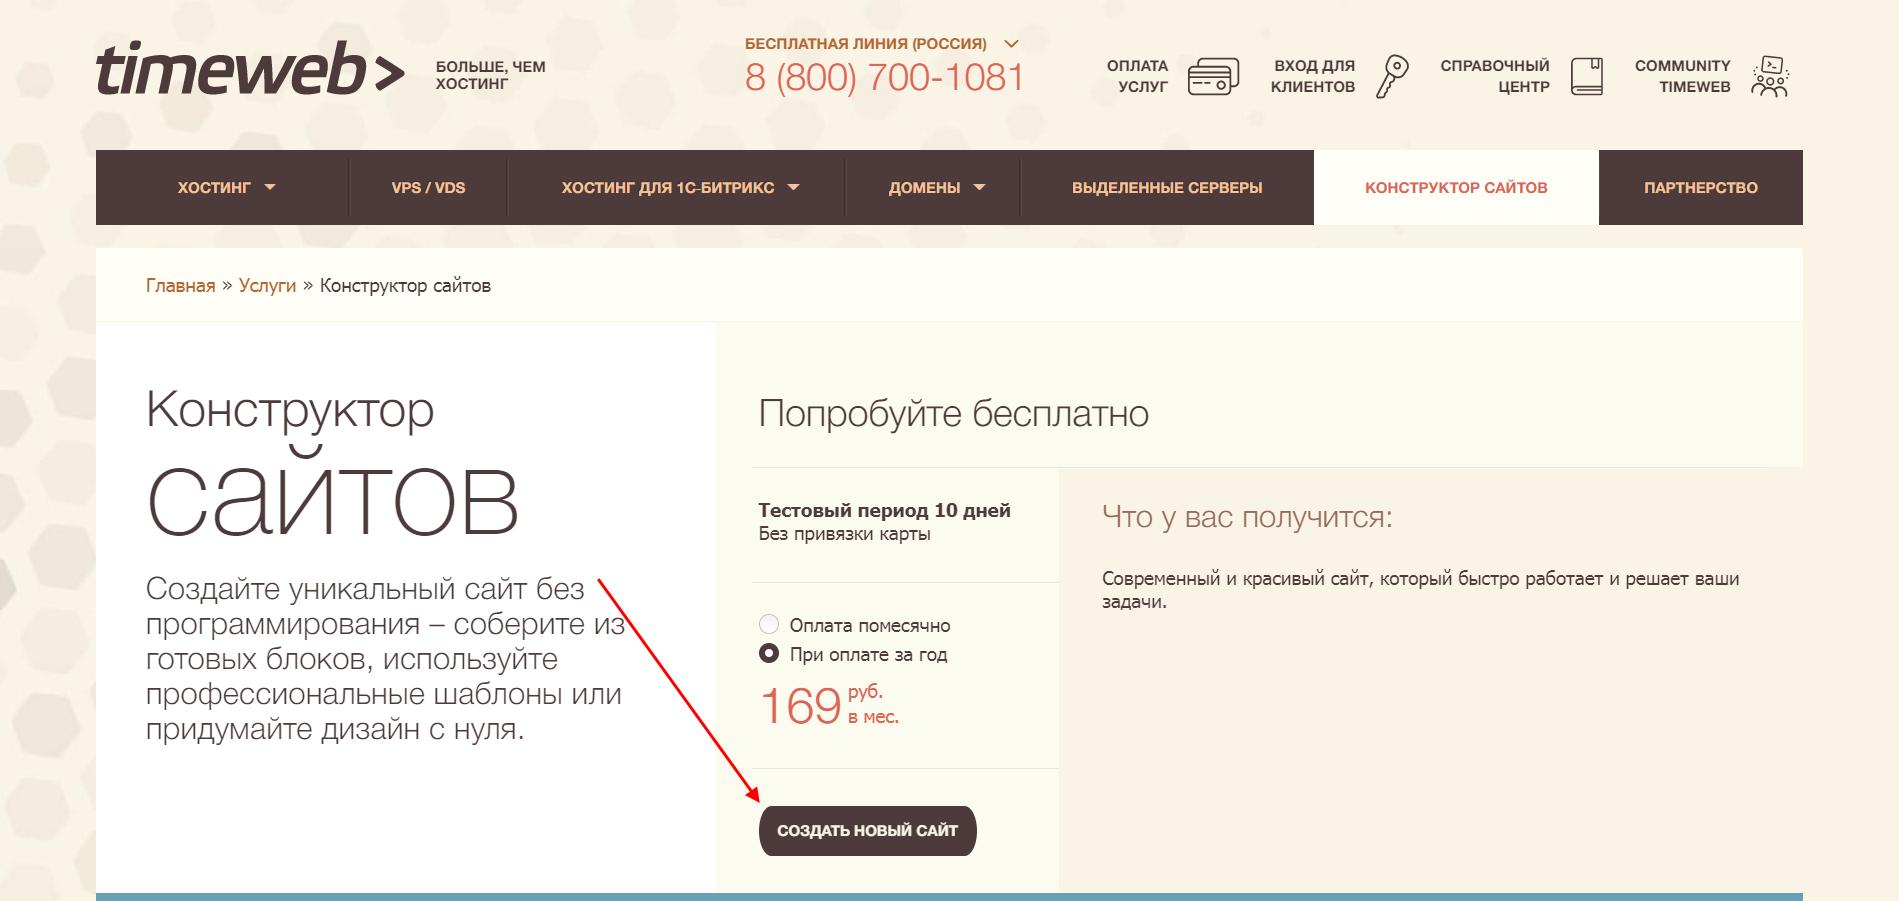 Конструктор сайтов от Timeweb регистрация